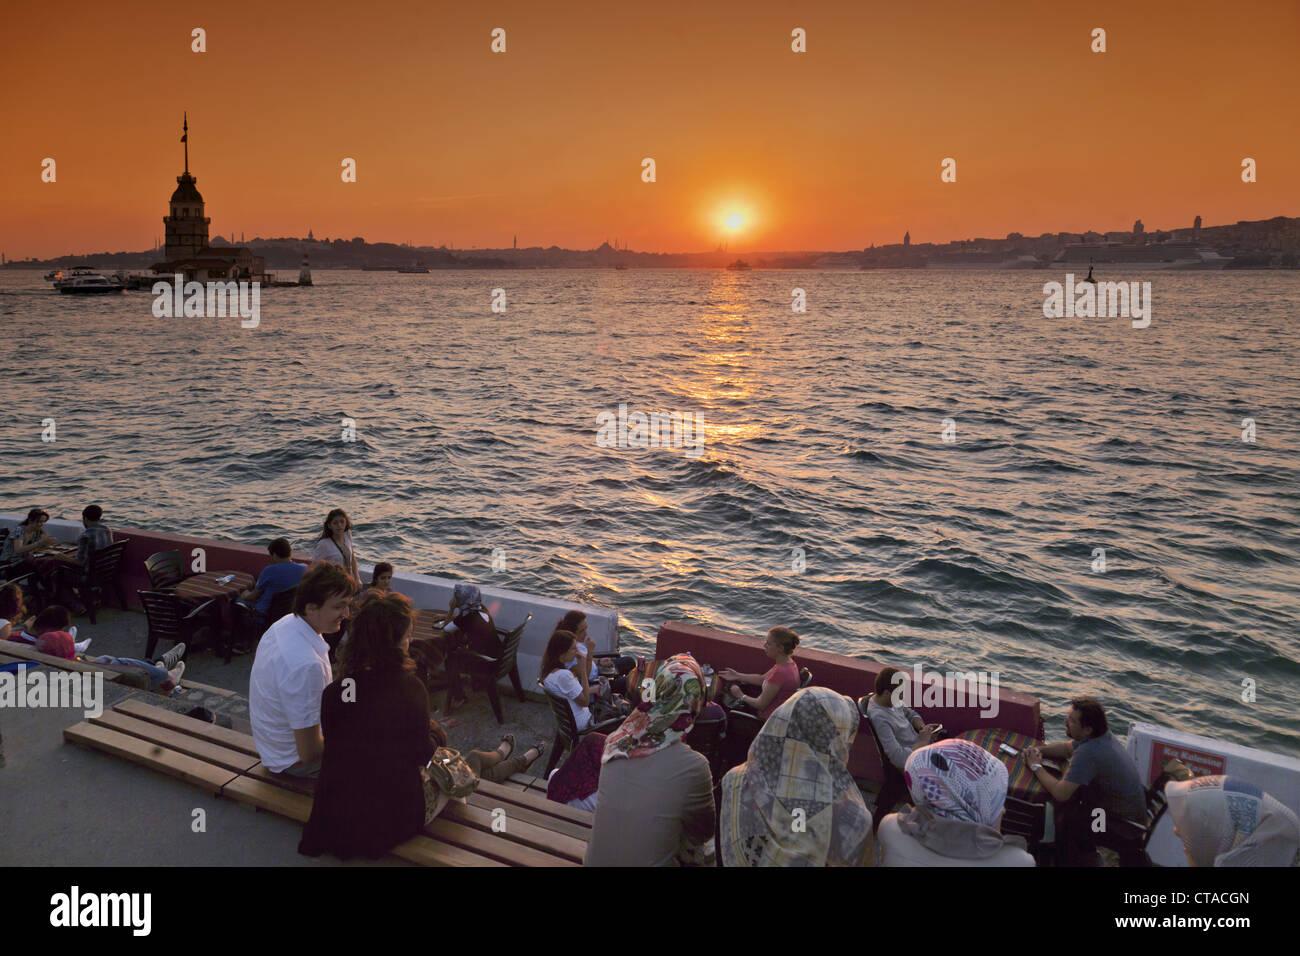 Lounge en el Bosporus Waterfront, Kis Kulesi torre al atardecer, Estambul, Turquía, Europa Imagen De Stock